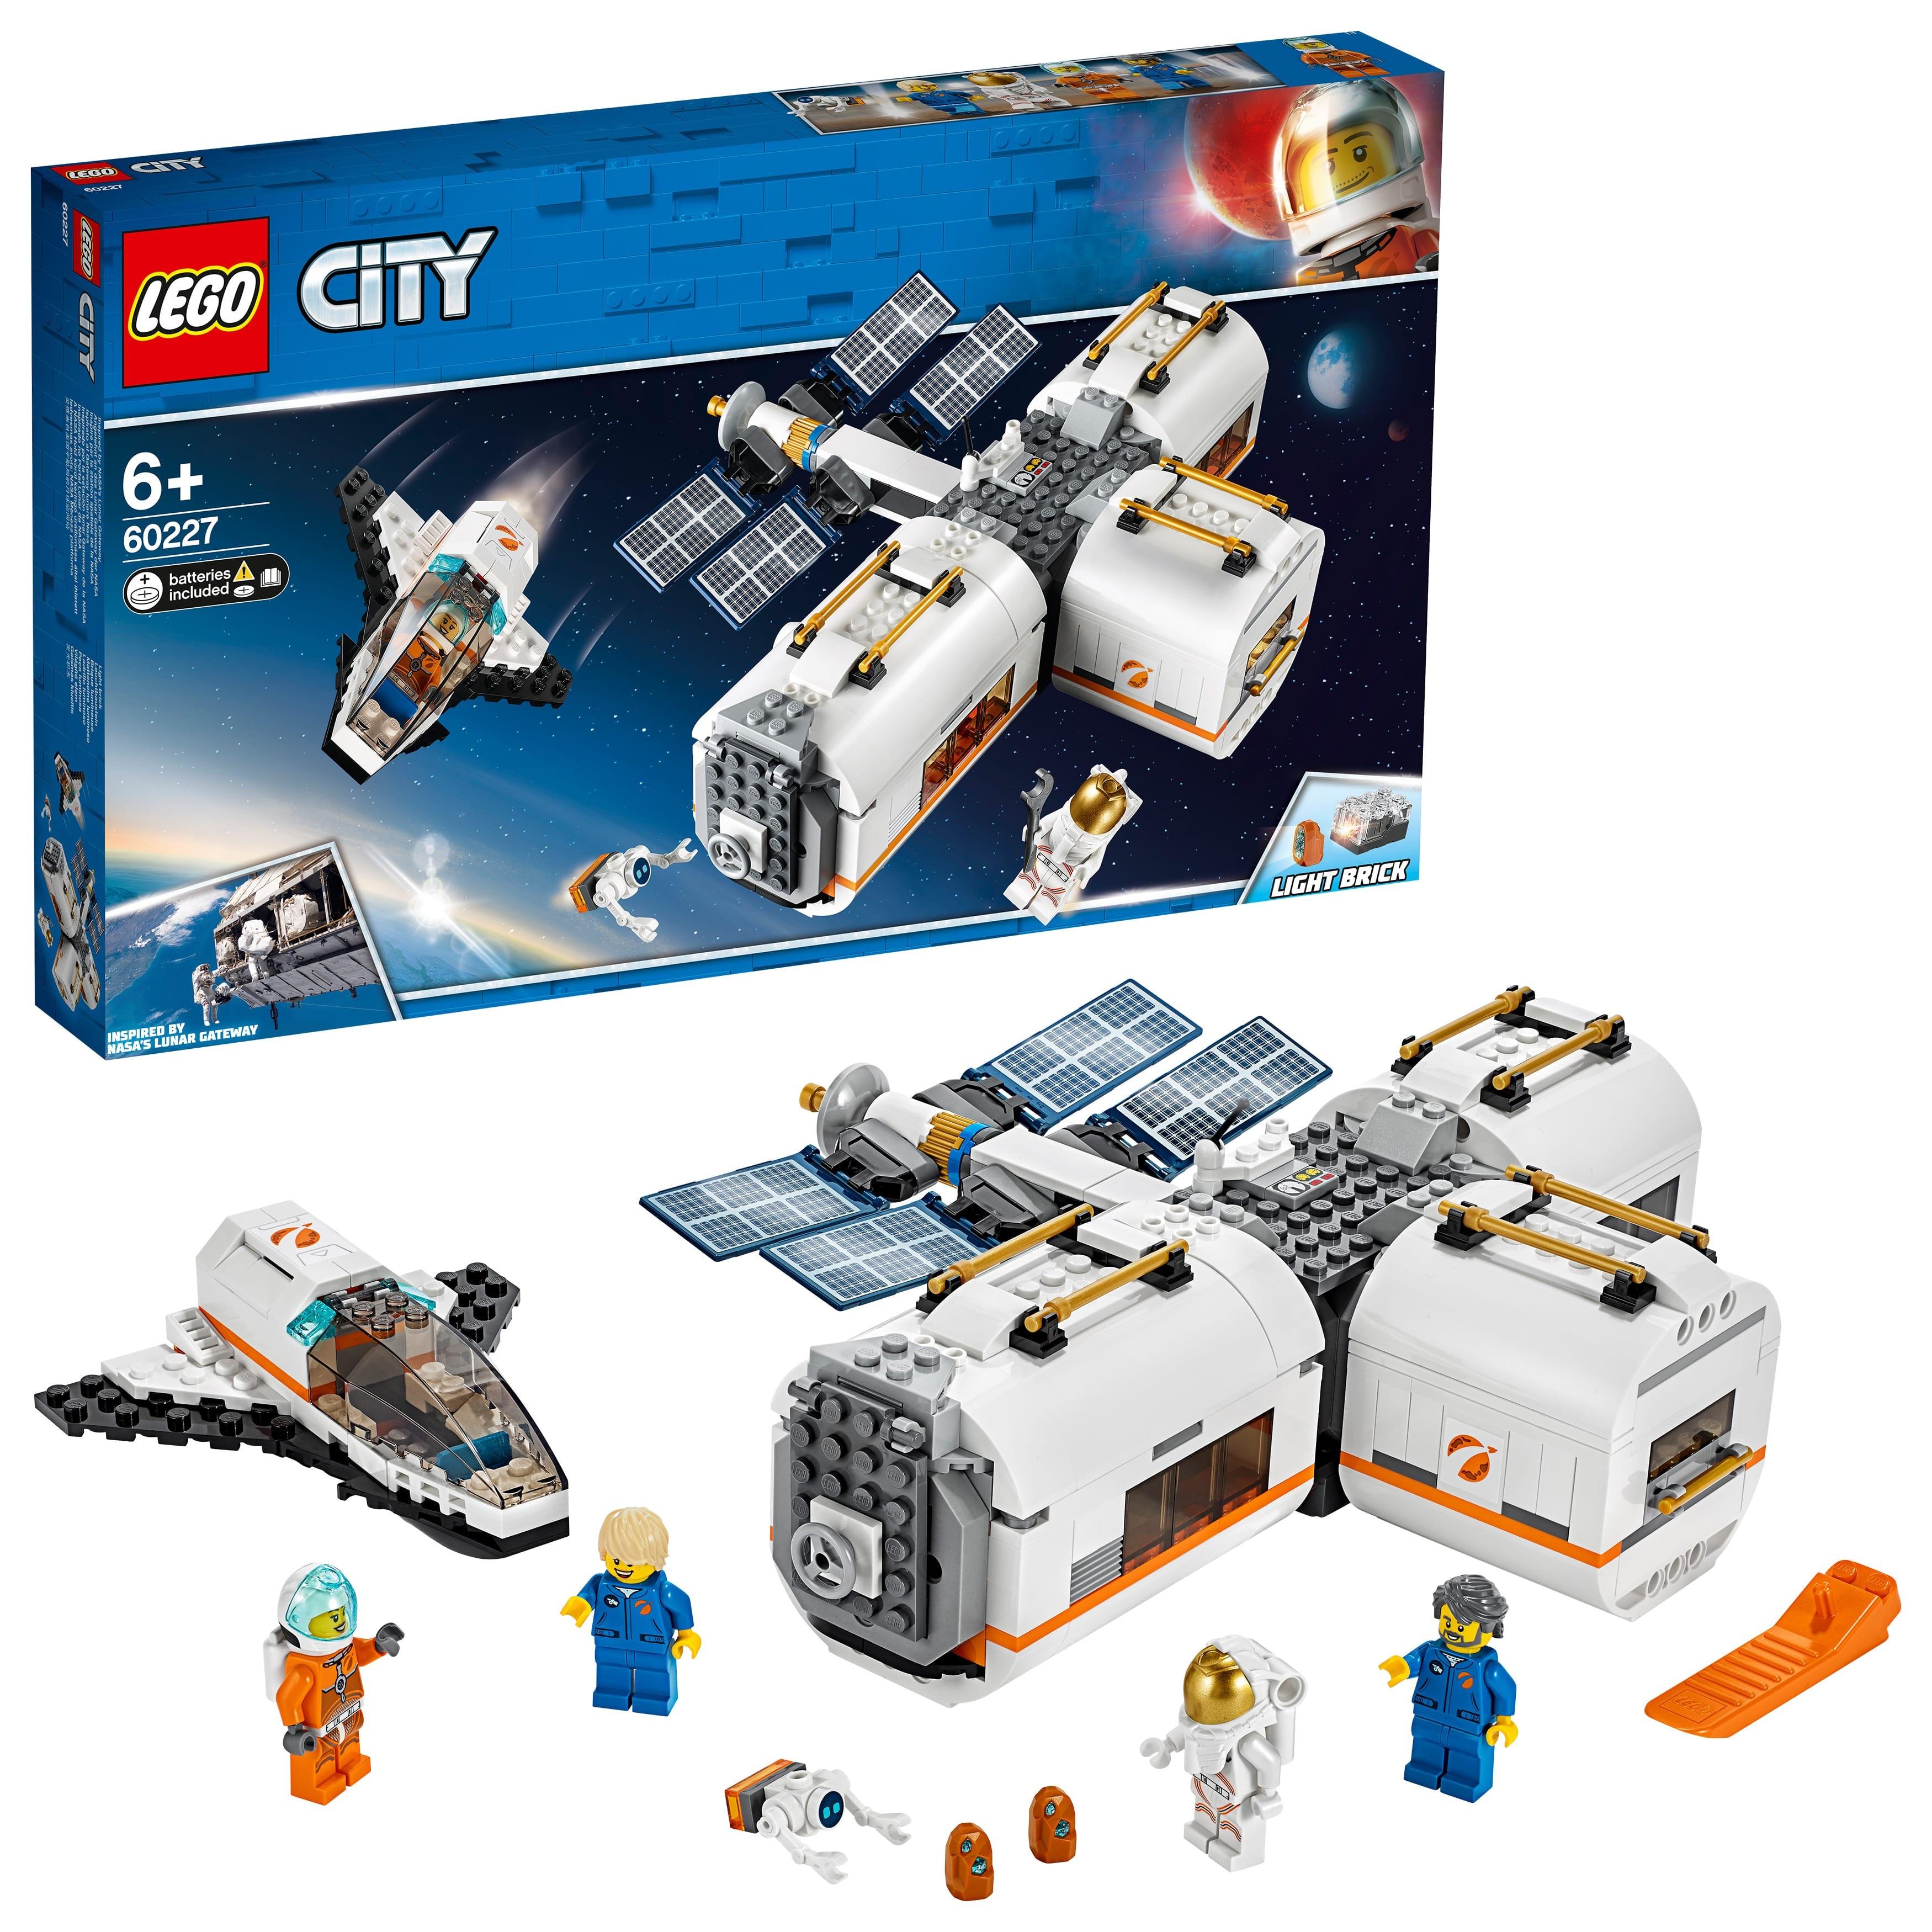 Designer Lego City 60227 Moon Space Station